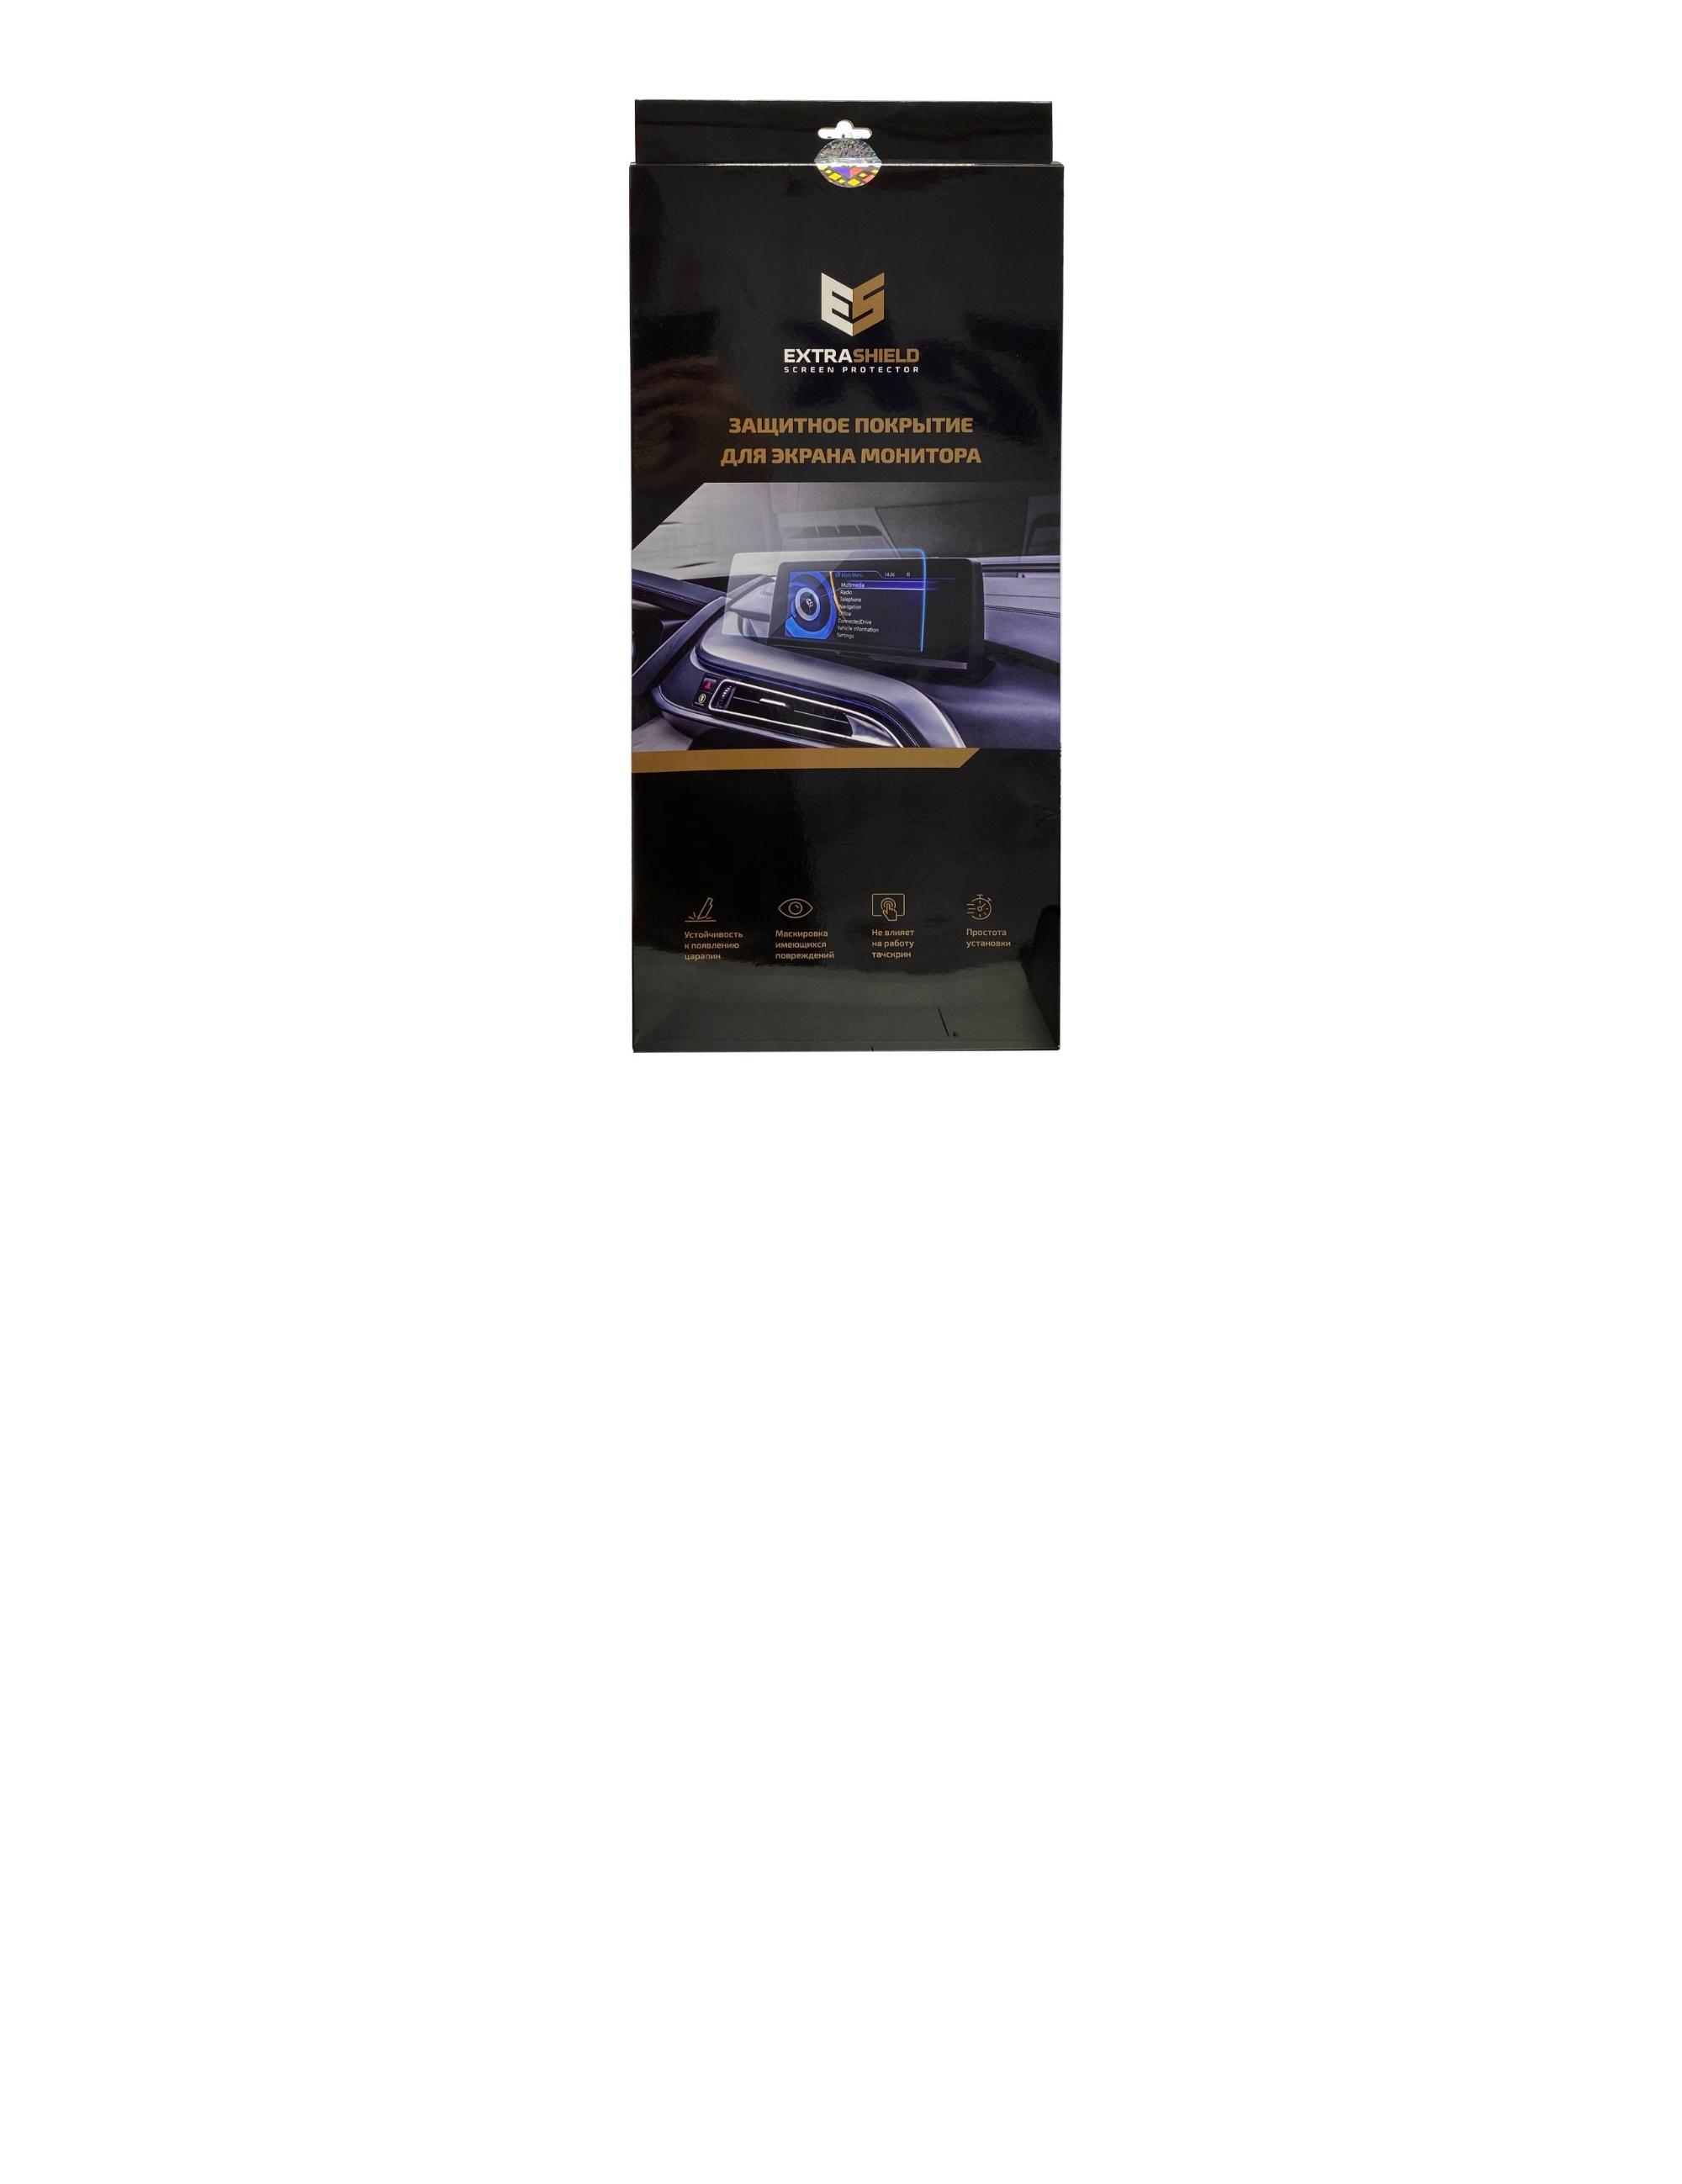 Land Rover Discovery Sport /HSE 2015 - 2017 мультимедиа 8 Защитное стекло Матовая